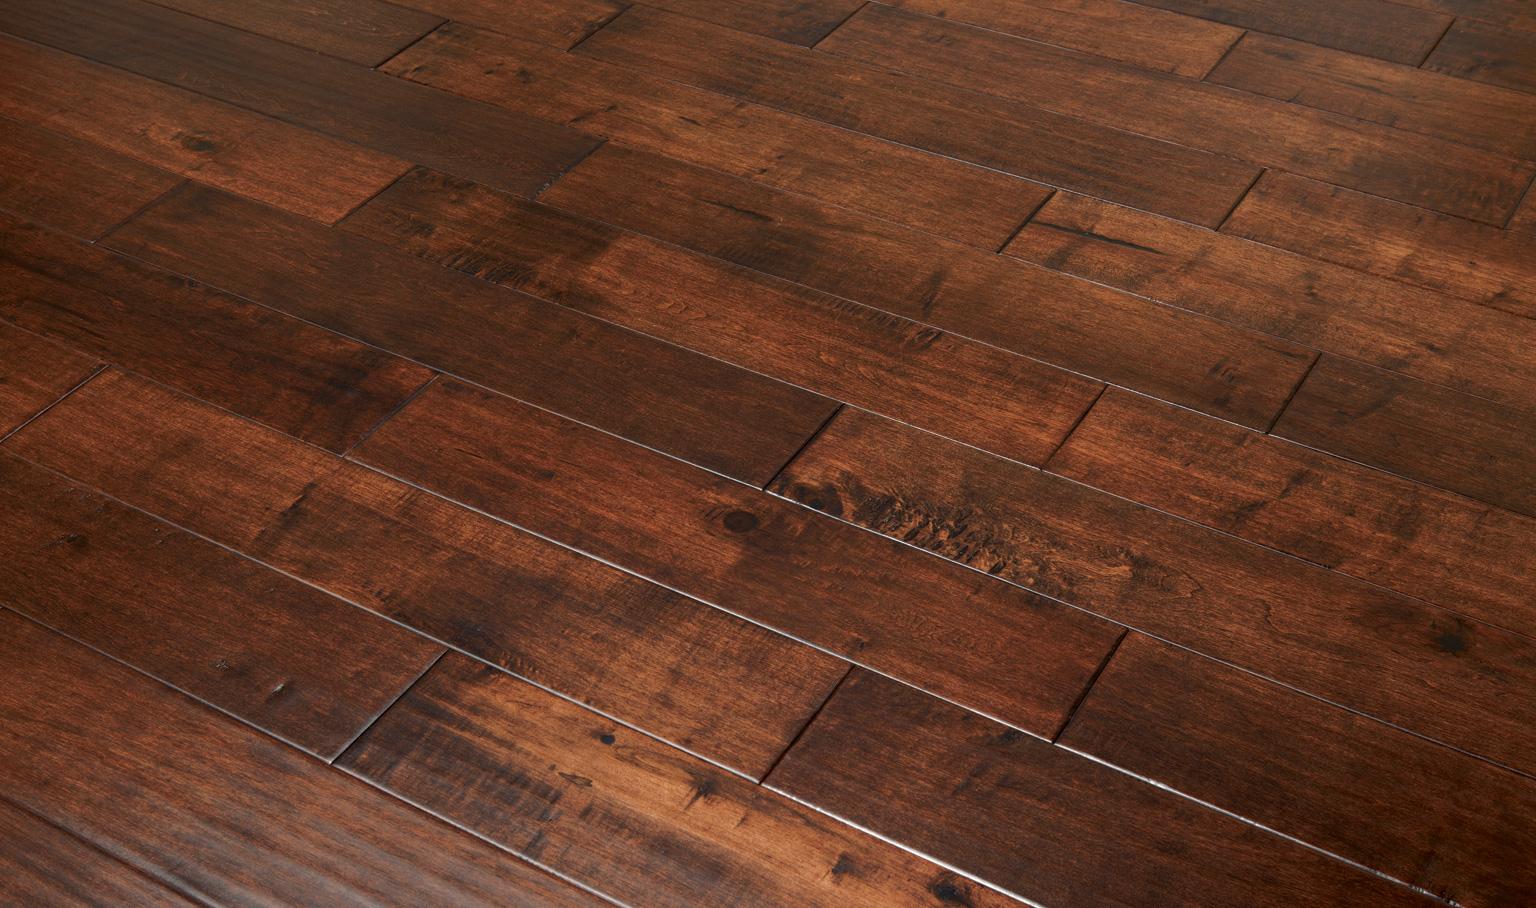 solid hardwood floor grant dark solid wood floors maple hardwood flooring unfinished solid maple  hardwood LMJPJQN